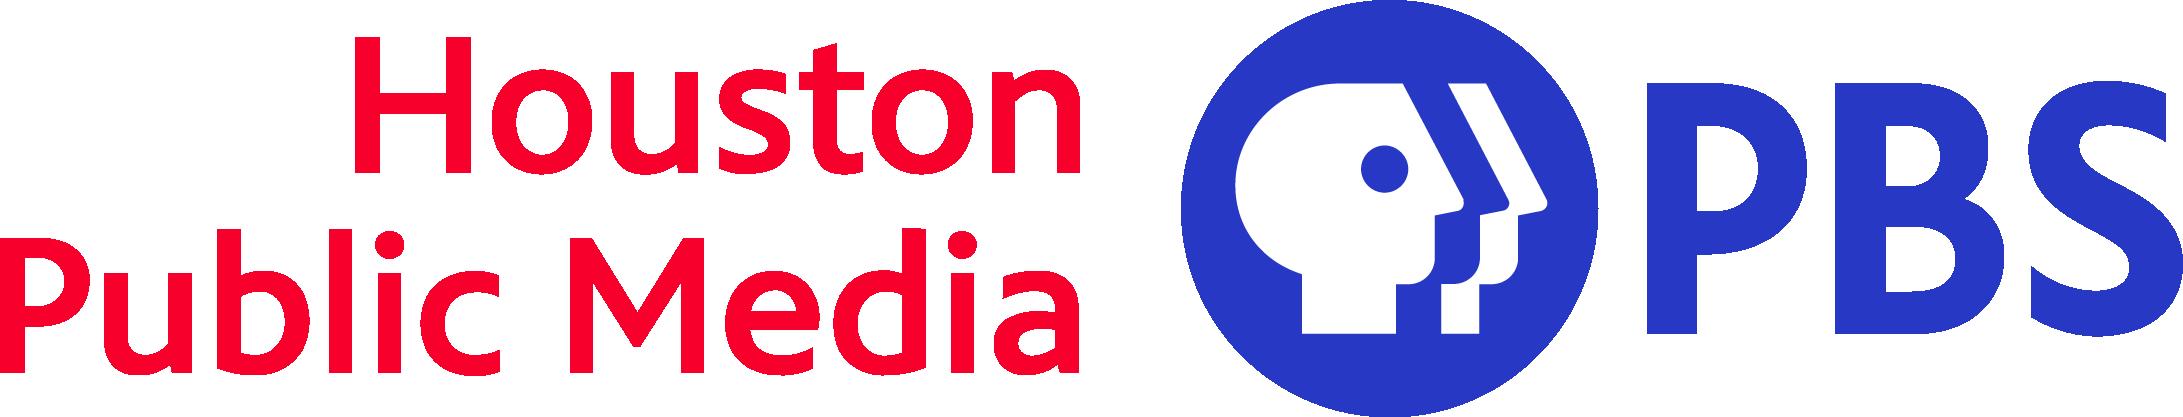 Houston Public Media TV 8